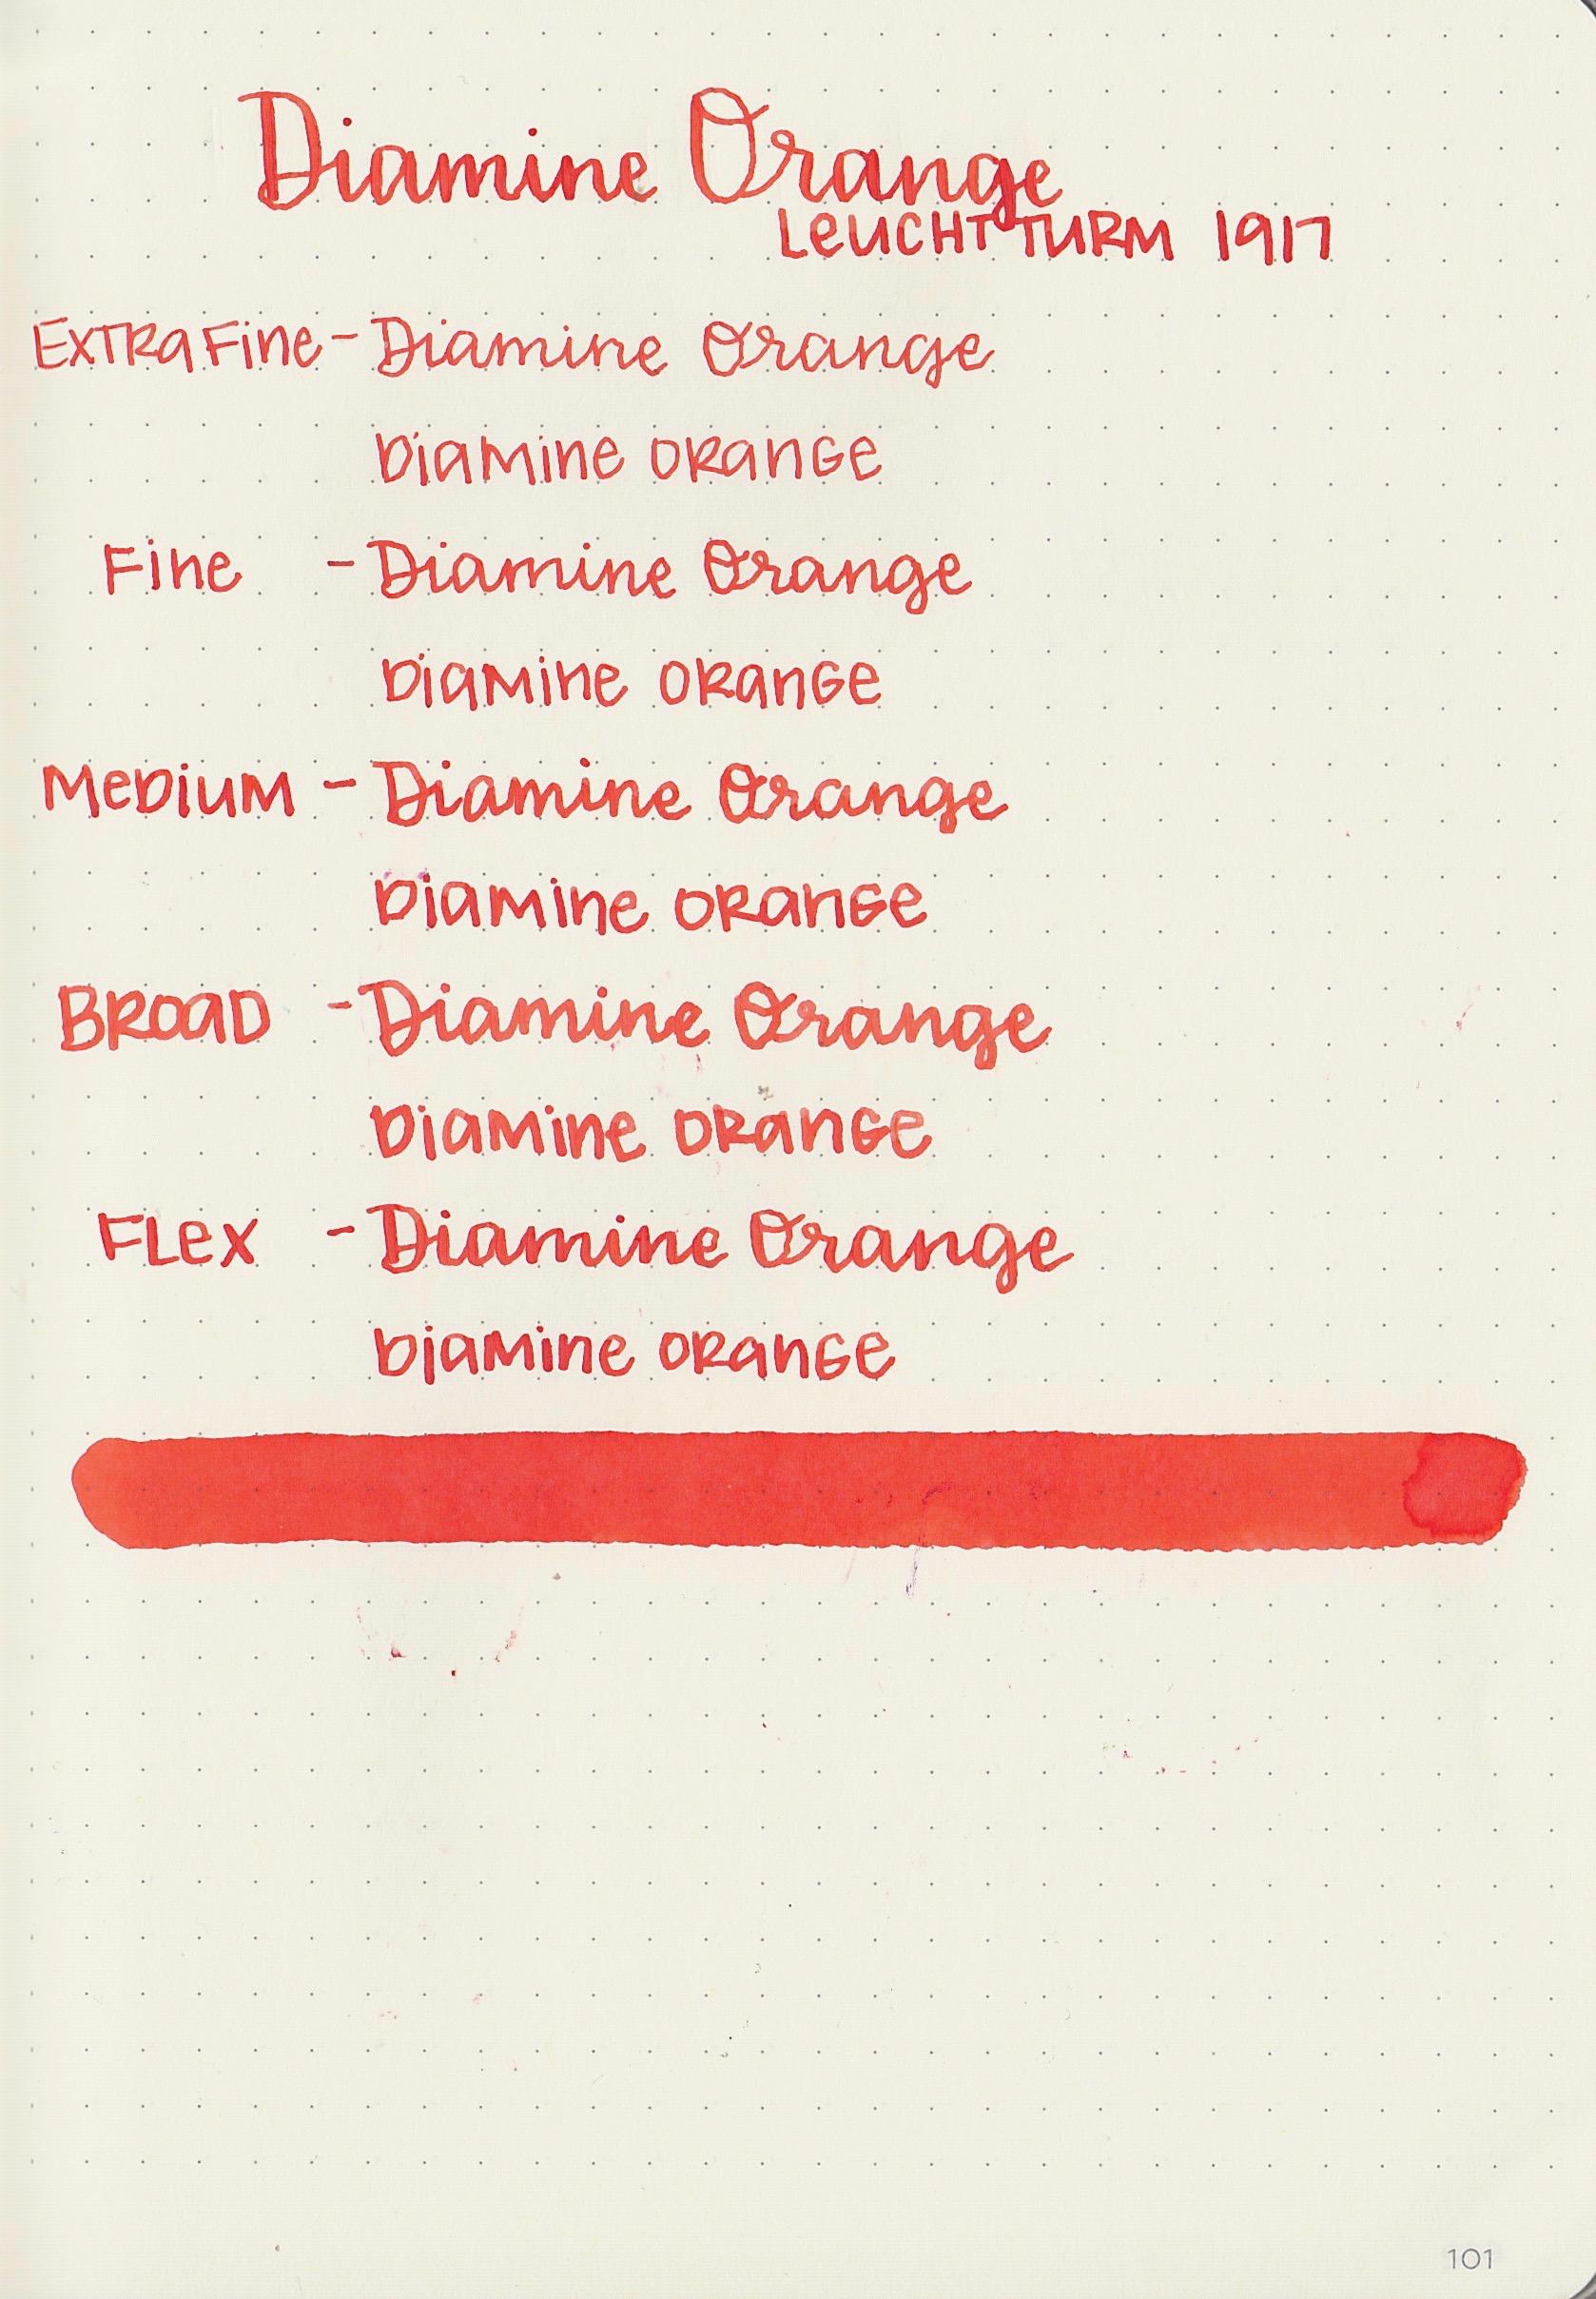 DiamineOrange - 11.jpg